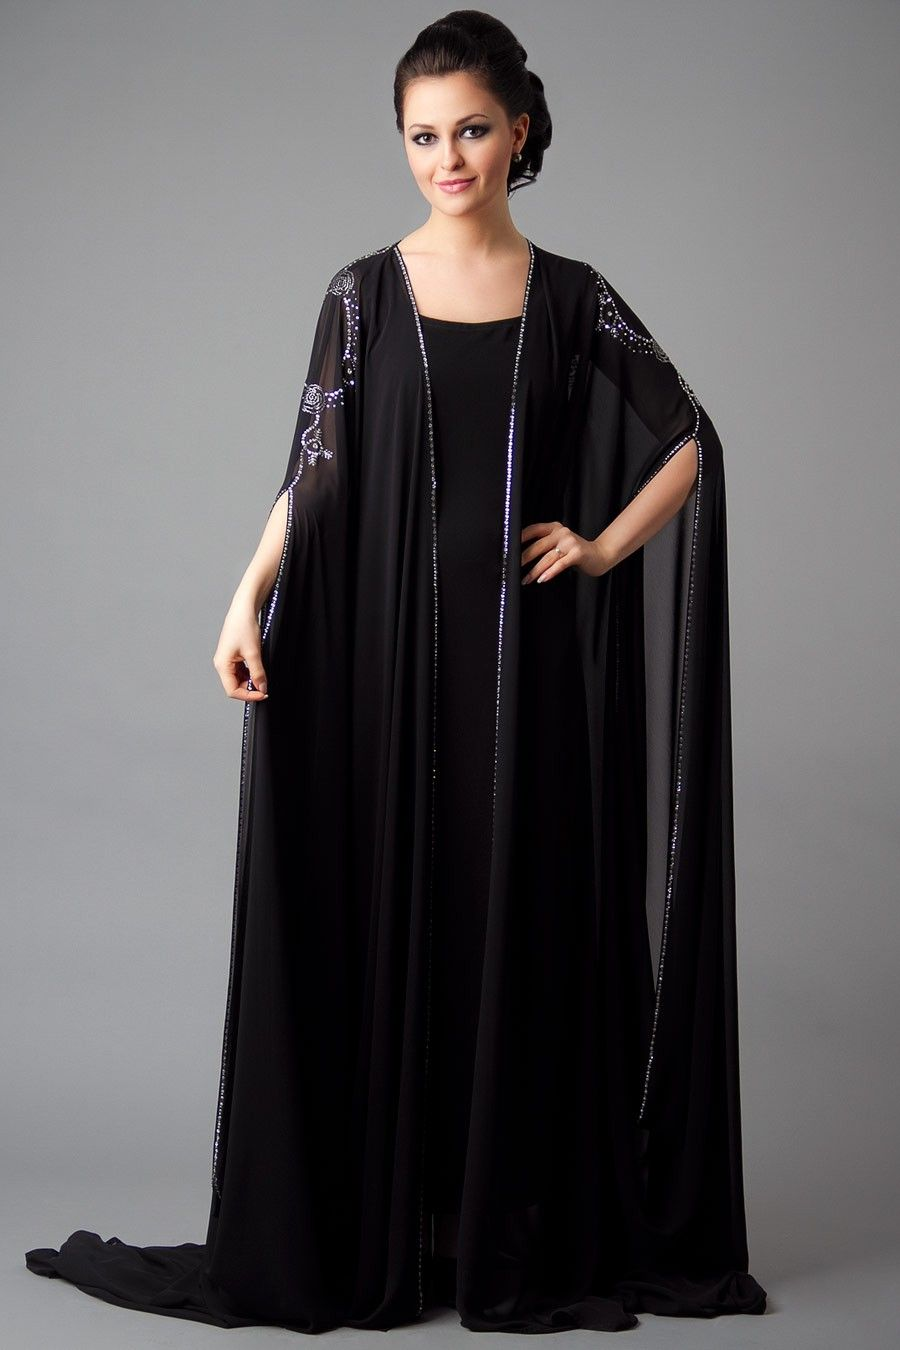 Wear scarf dubai style dresses